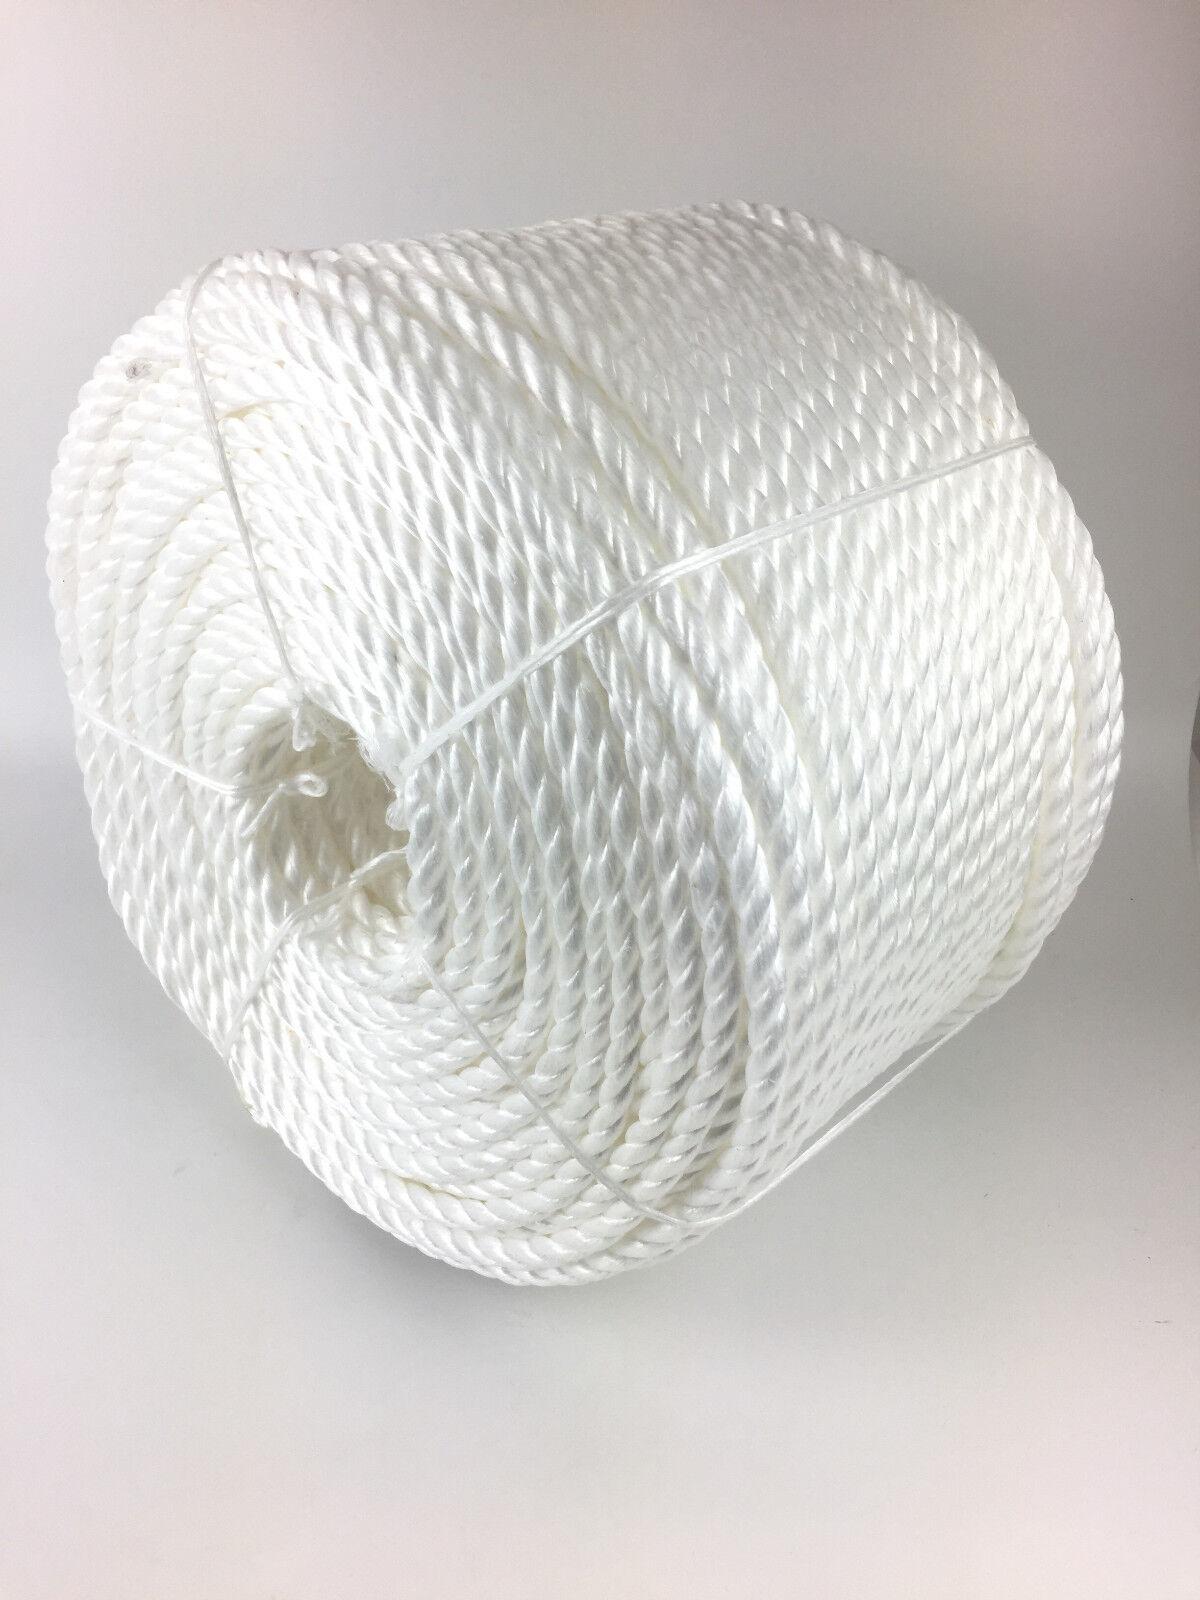 12mm weiß Polypropylen Seil 220 Meter, Poly-Seil Rollen, preiswert Nylon Seil